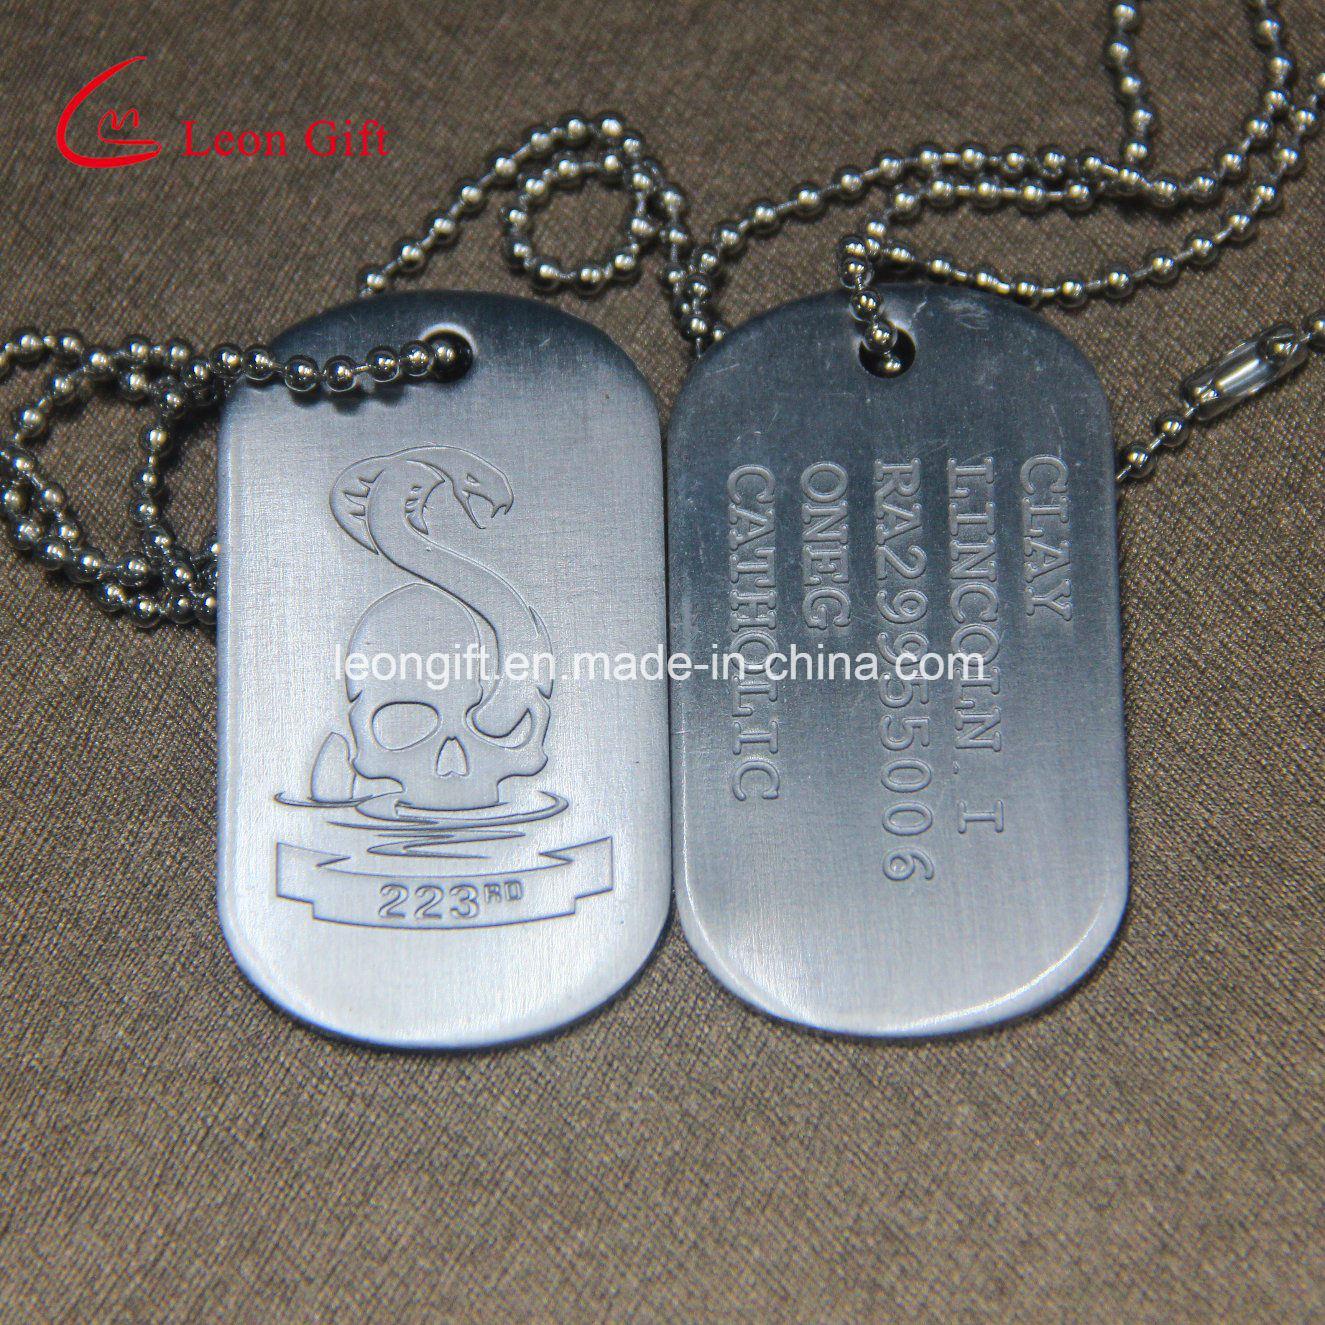 Factory Custom Ball Chain Military Dog Tag